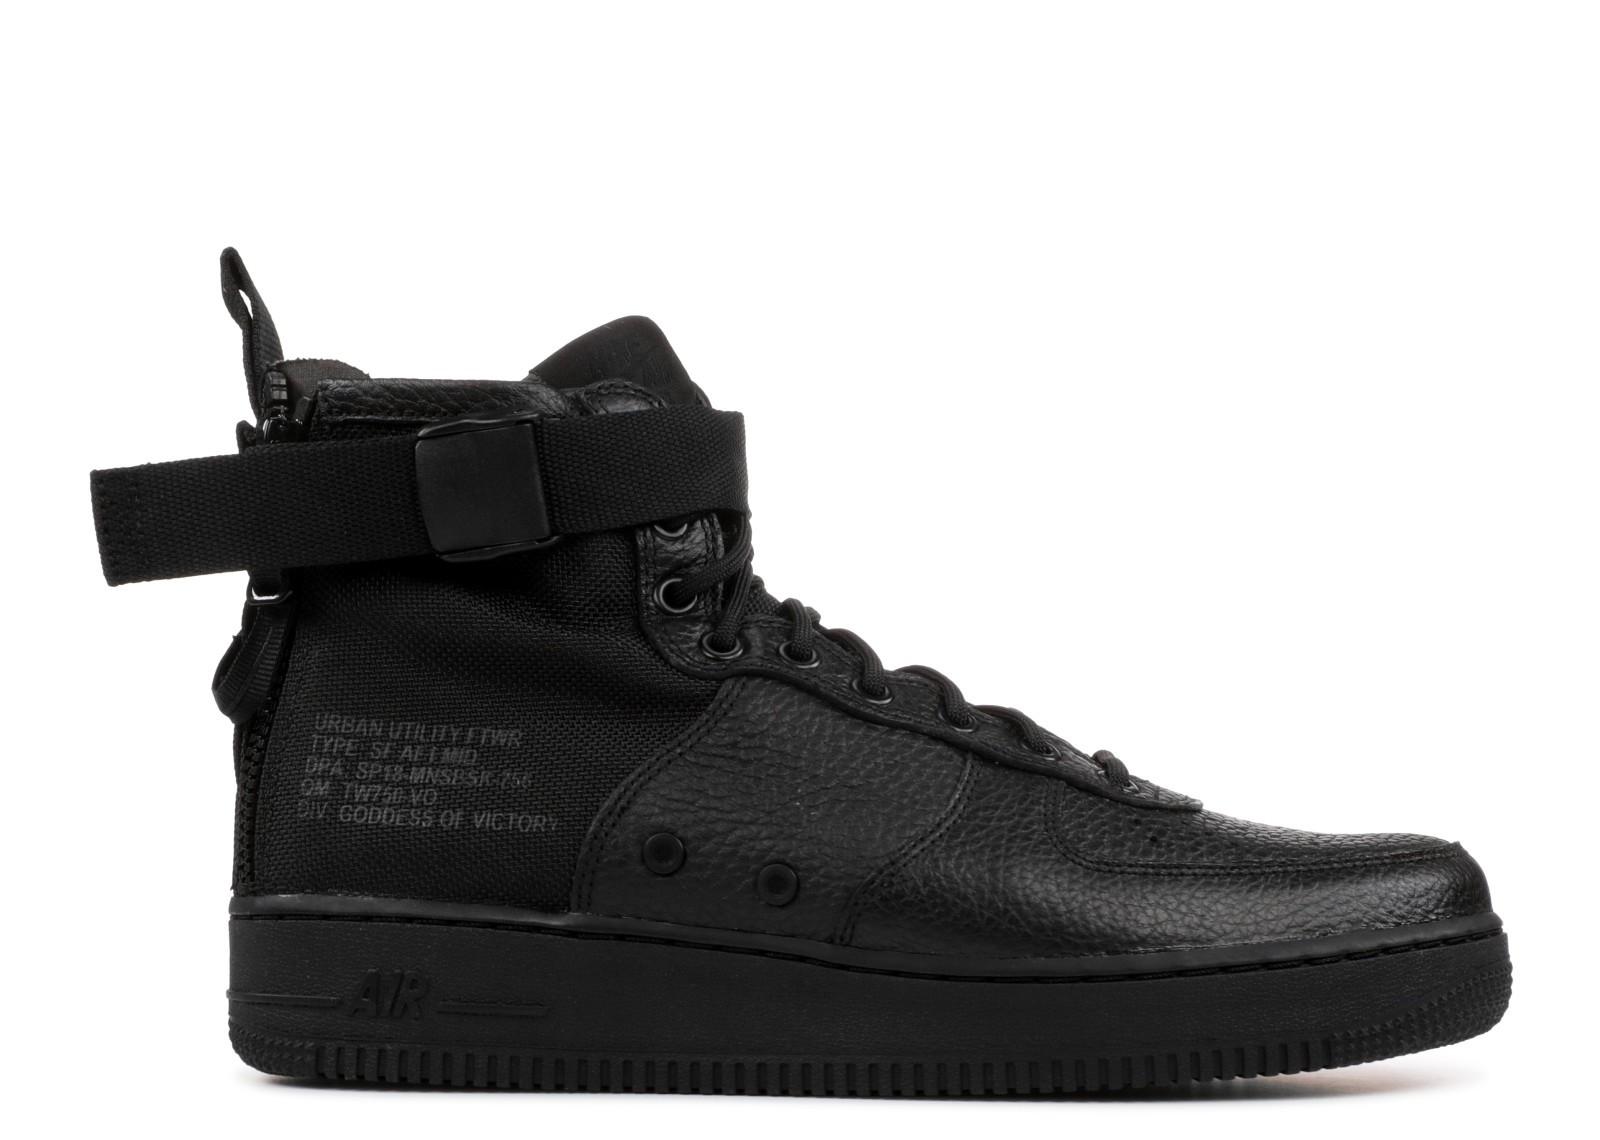 promo code d3aba c0615 Prev Nike Air Force 1 Sf Af1 Mid Black 917753-005